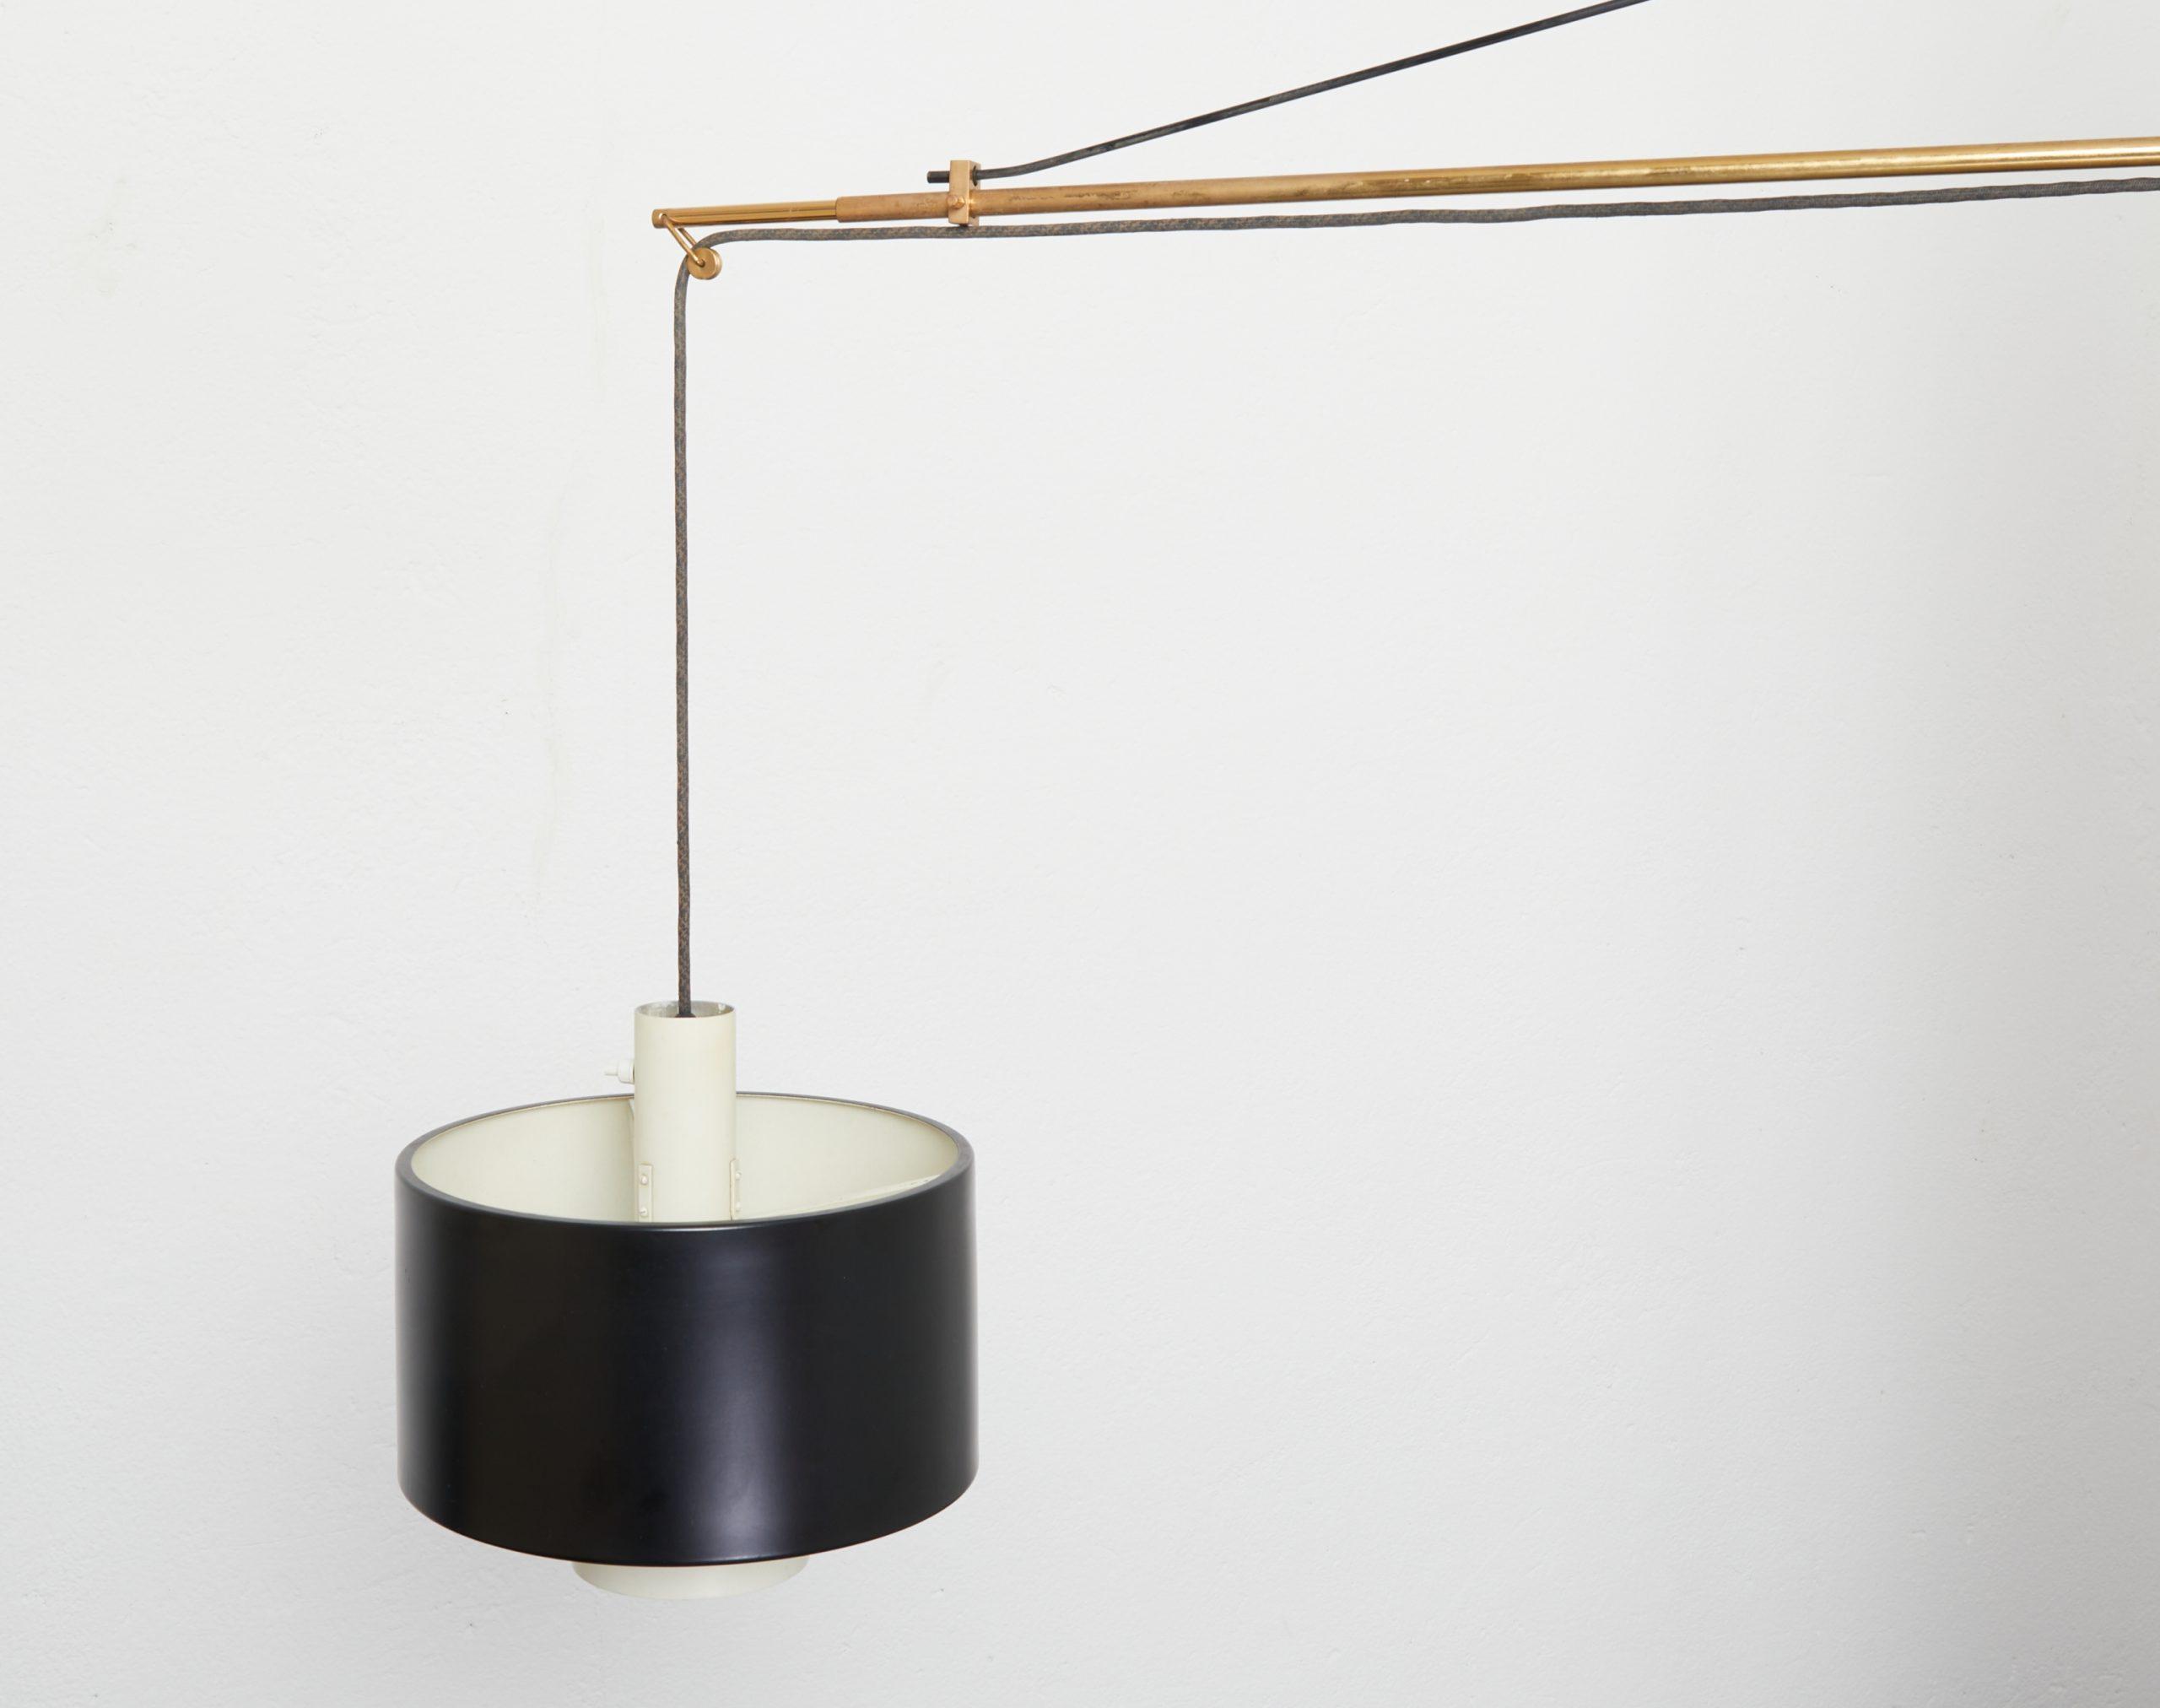 brass-wall-lamp-model-2061-by-gaetano-scolari-for-stilnovo-1954-image-04